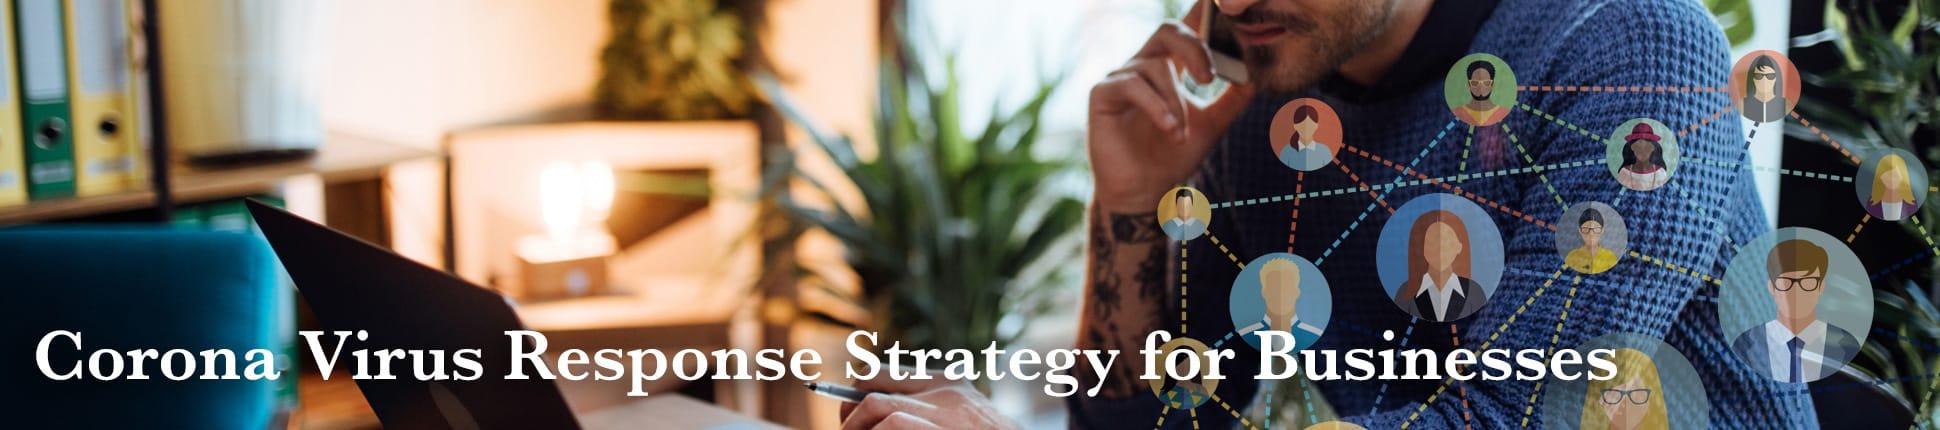 Corona Virus Response Strategy for Businesses